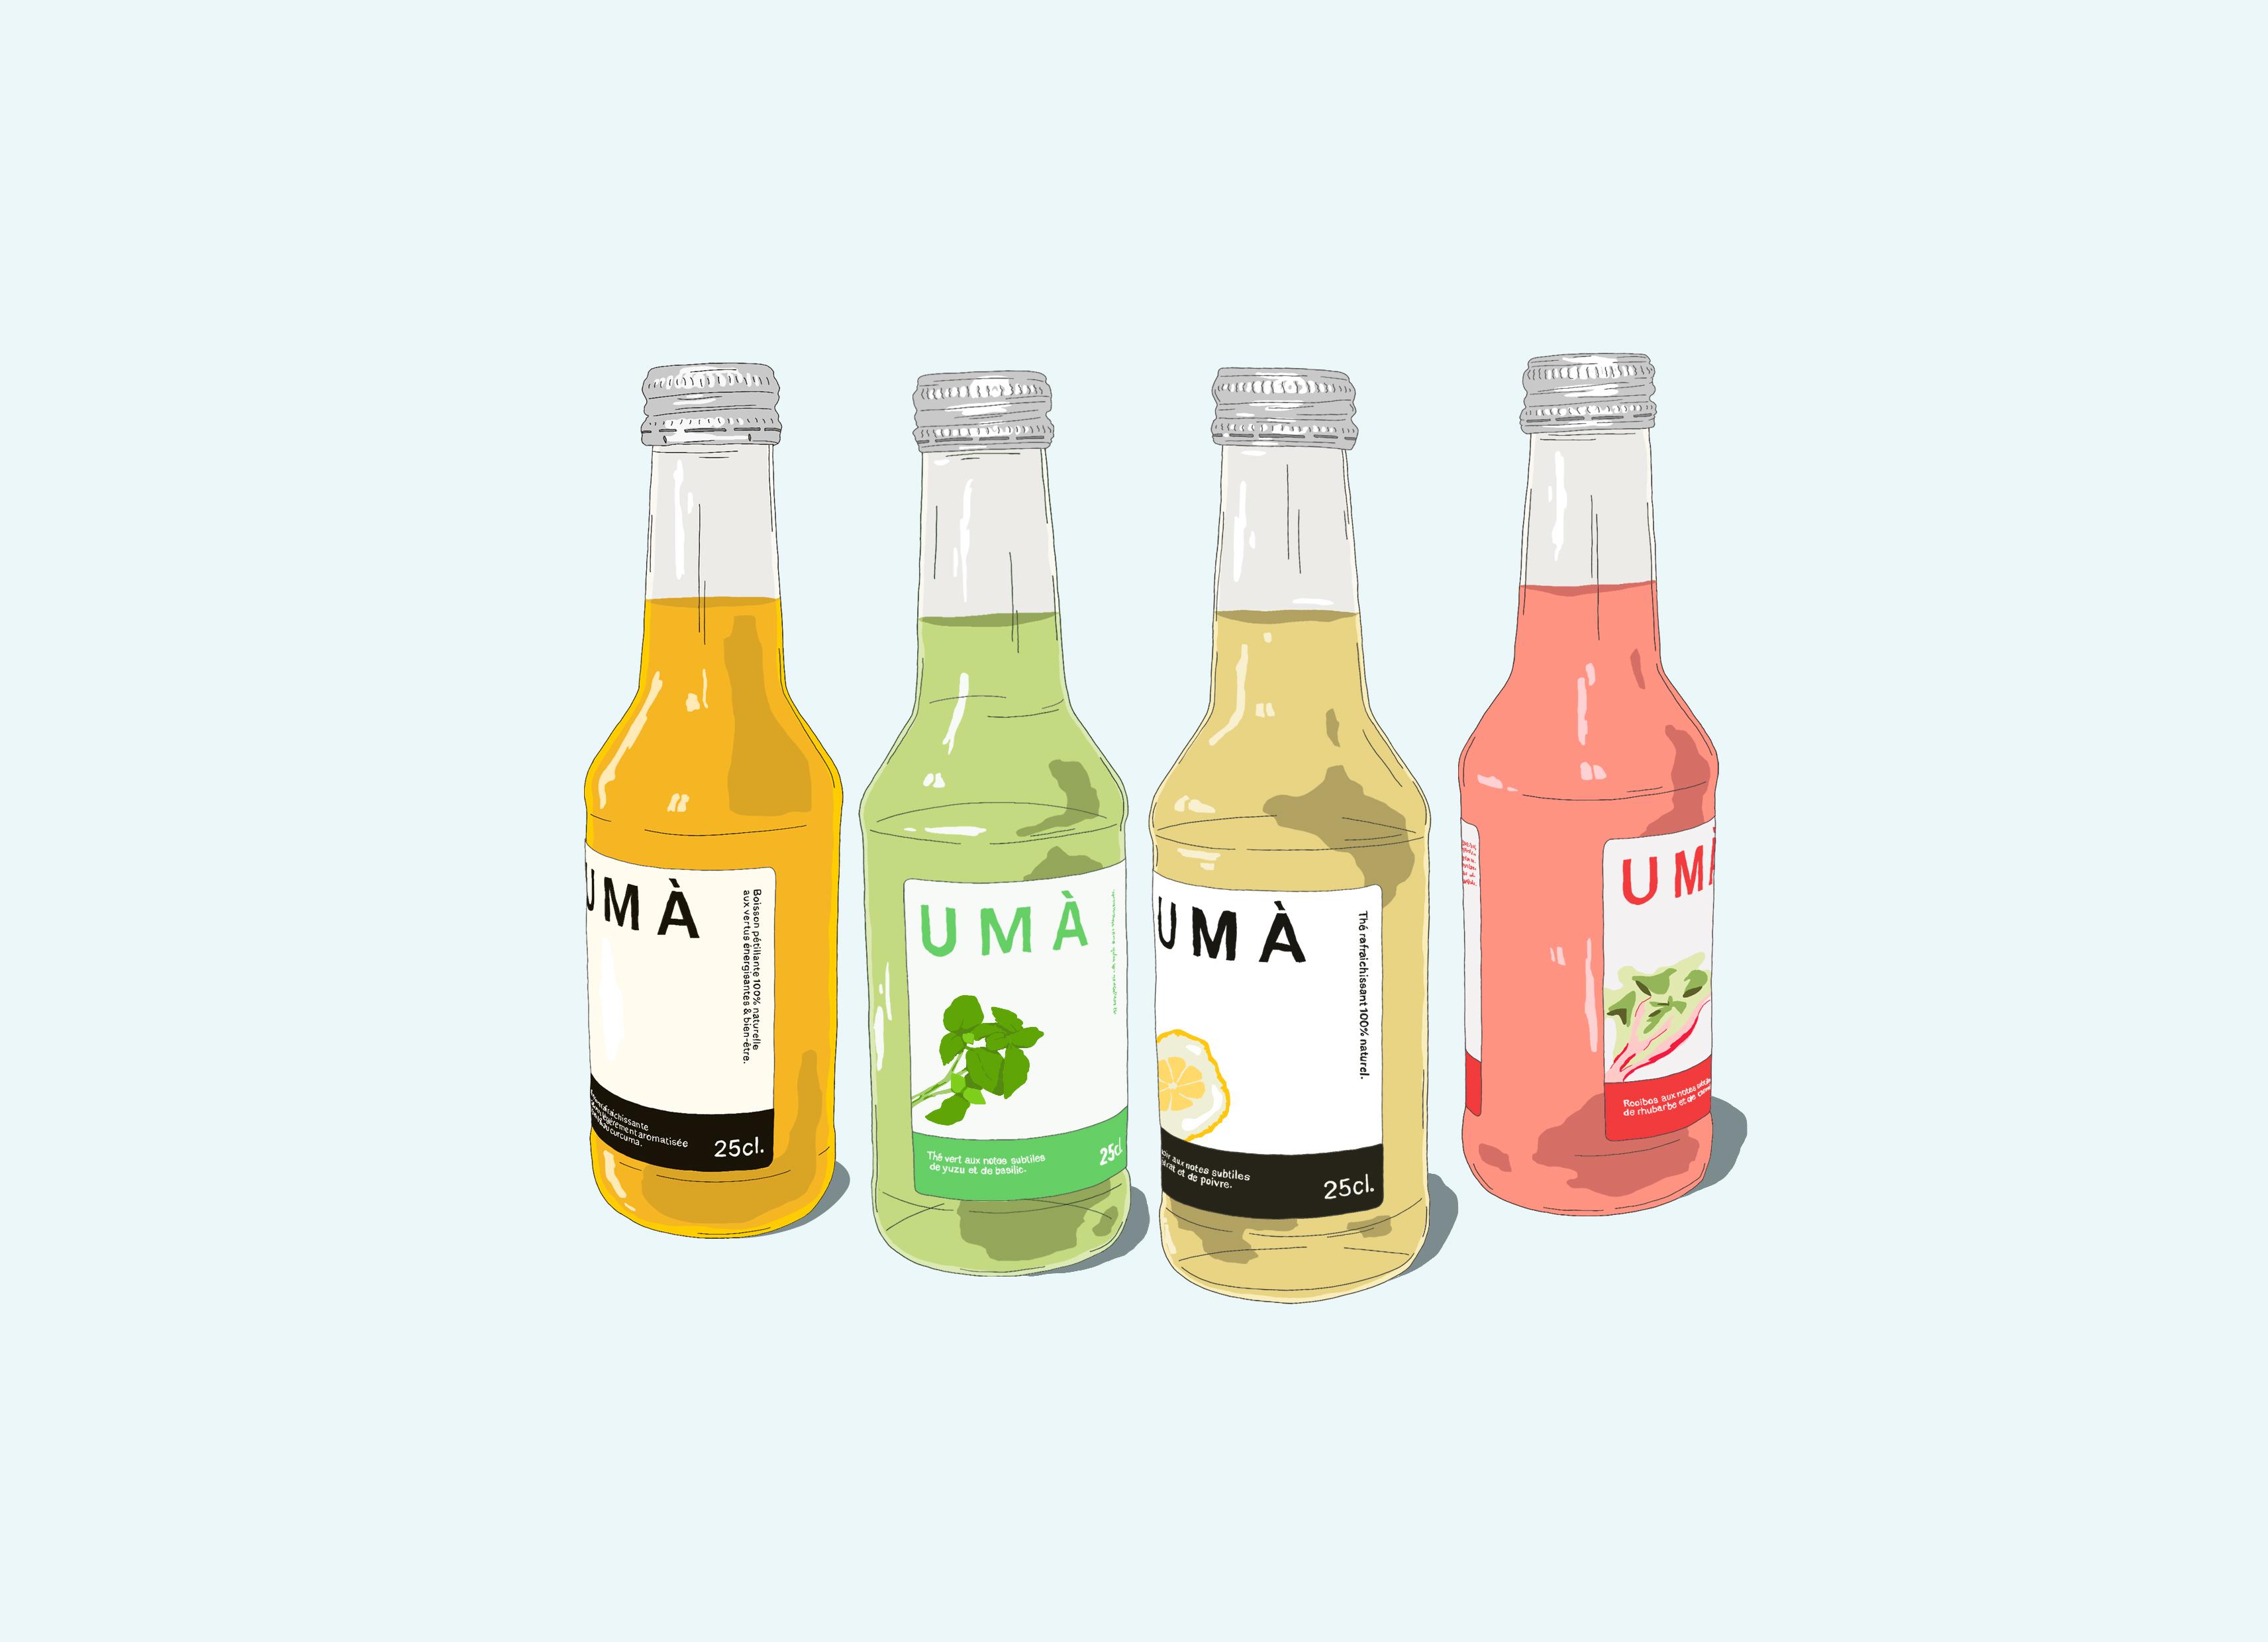 bouteilles-lot-1454864787.jpg